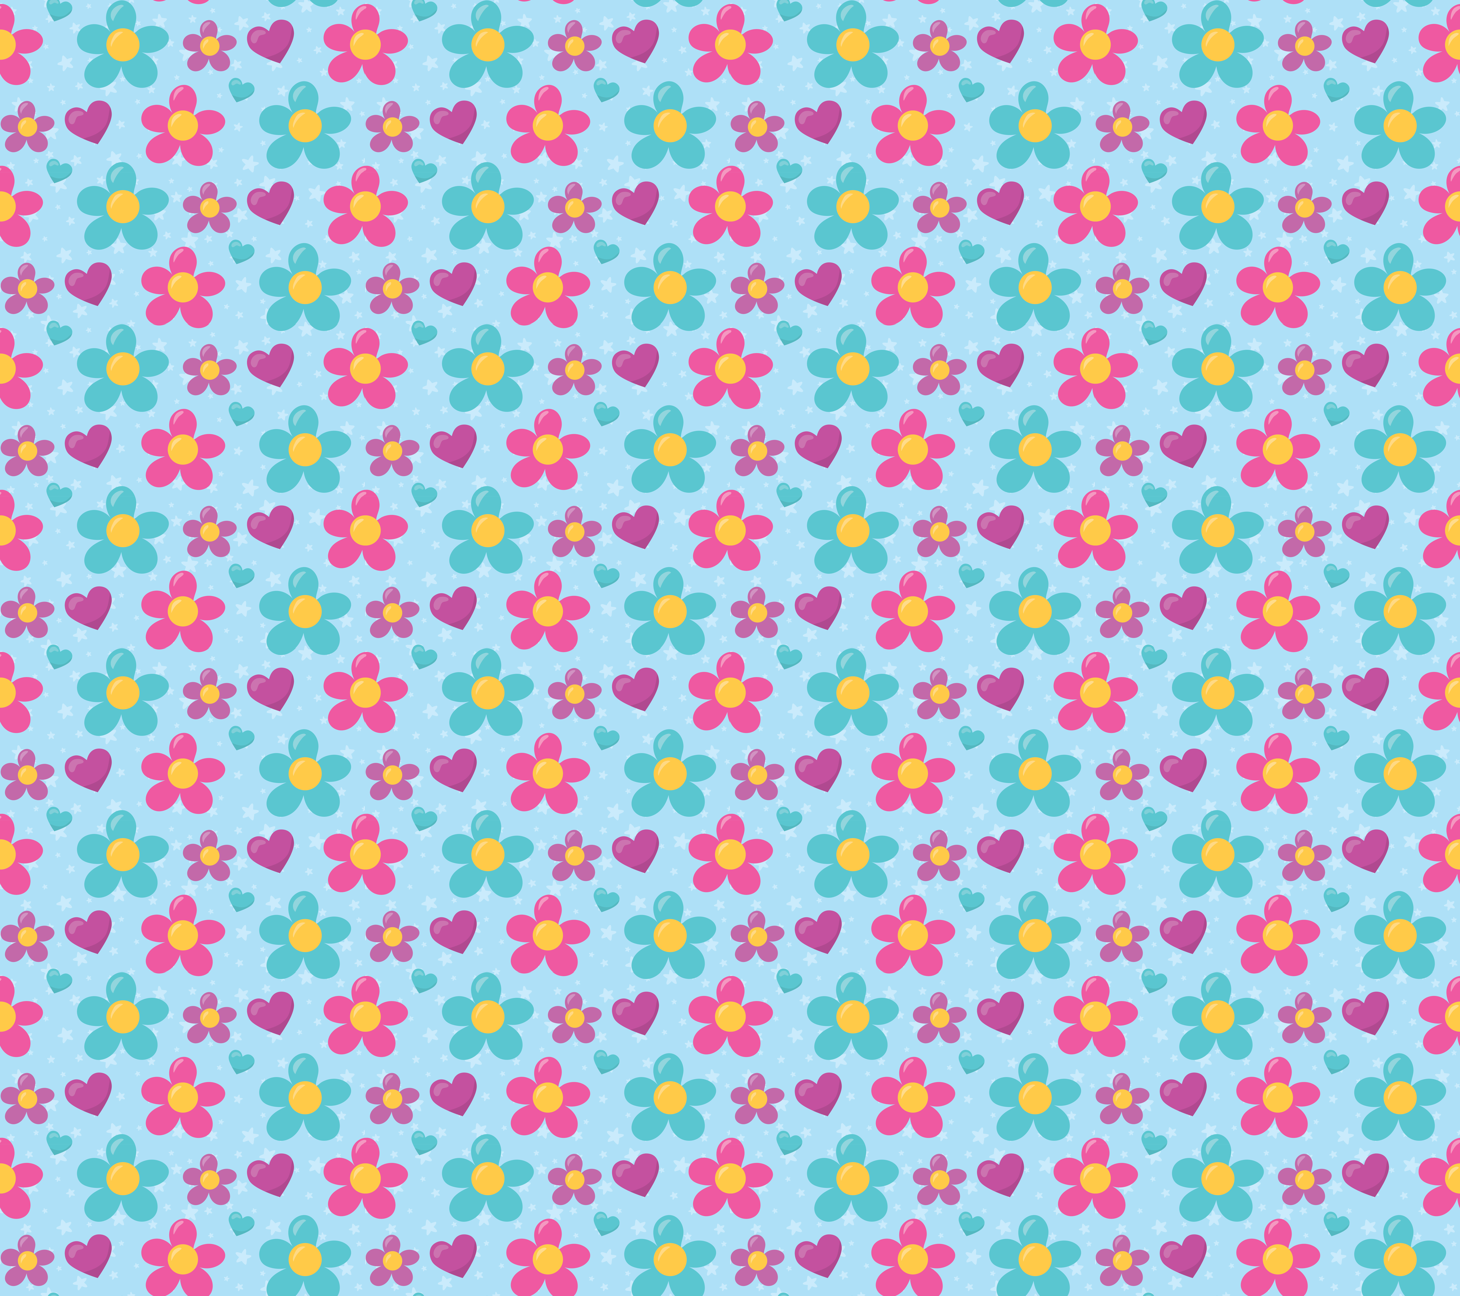 Fairies and Unicorns 03 fabric by prettygrafik on Spoonflower - custom fabric